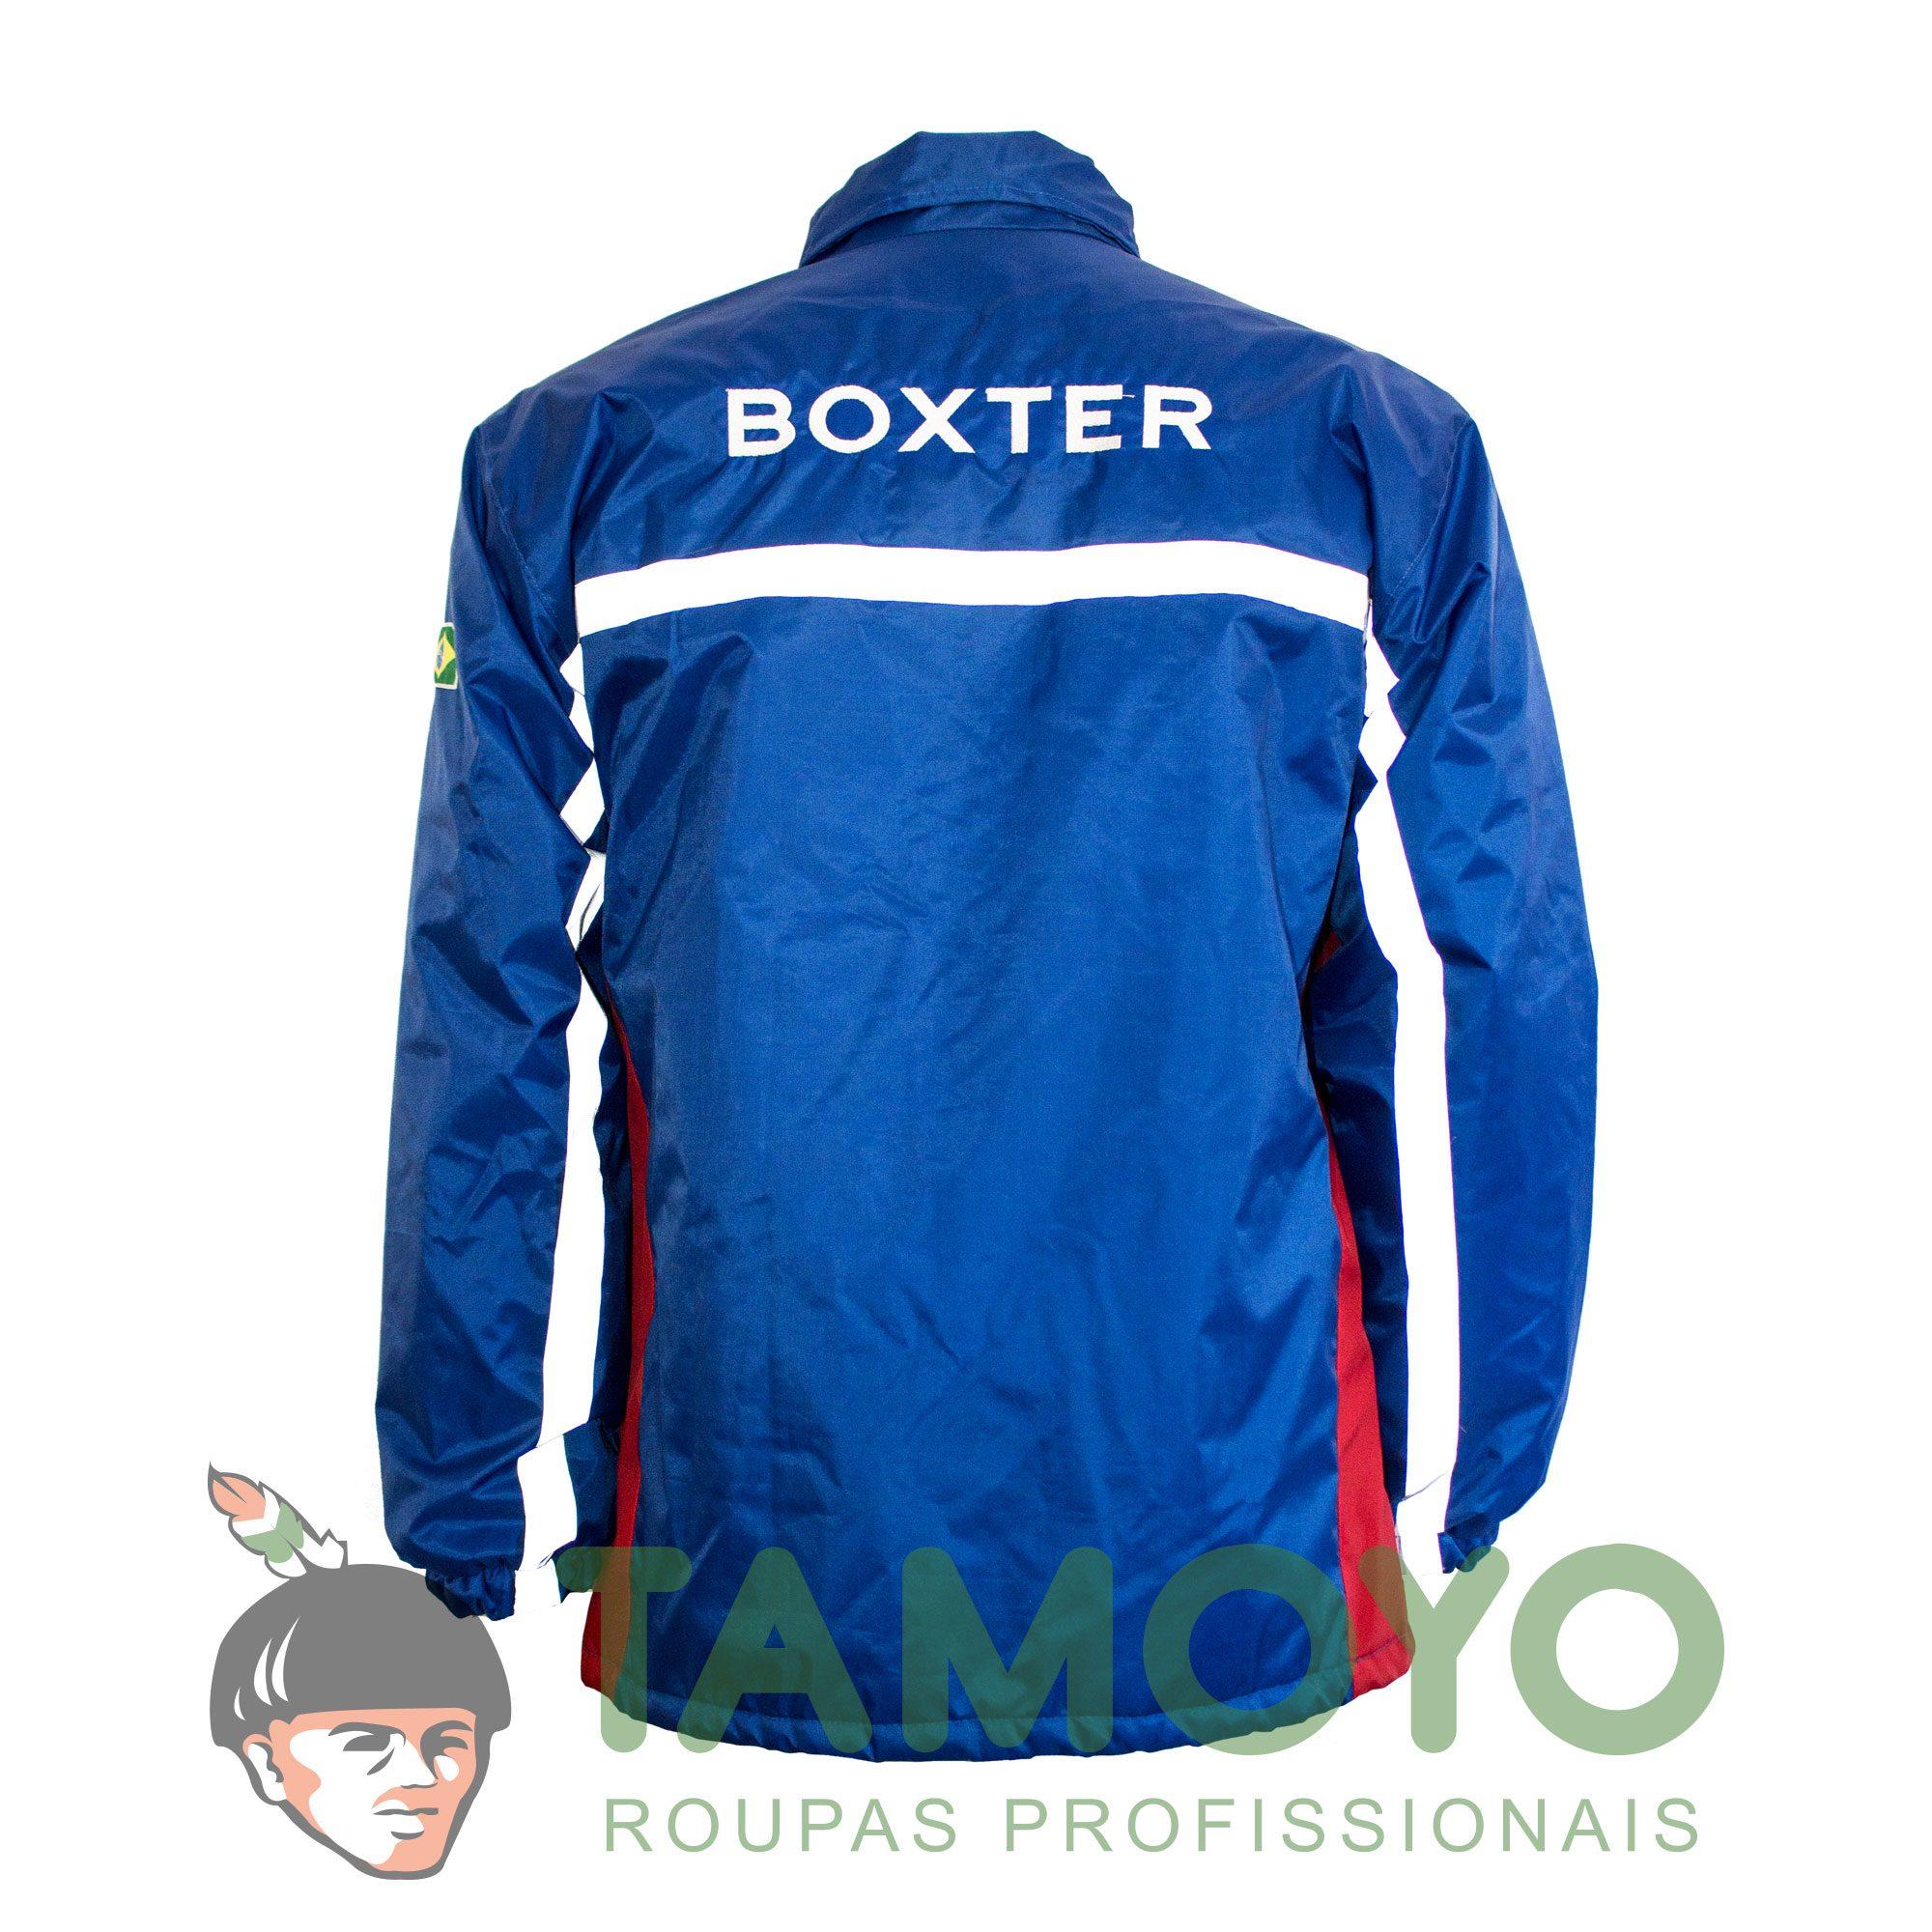 jaqueta-boxter-roupas-tamoyo-uniformes-profissionais-c